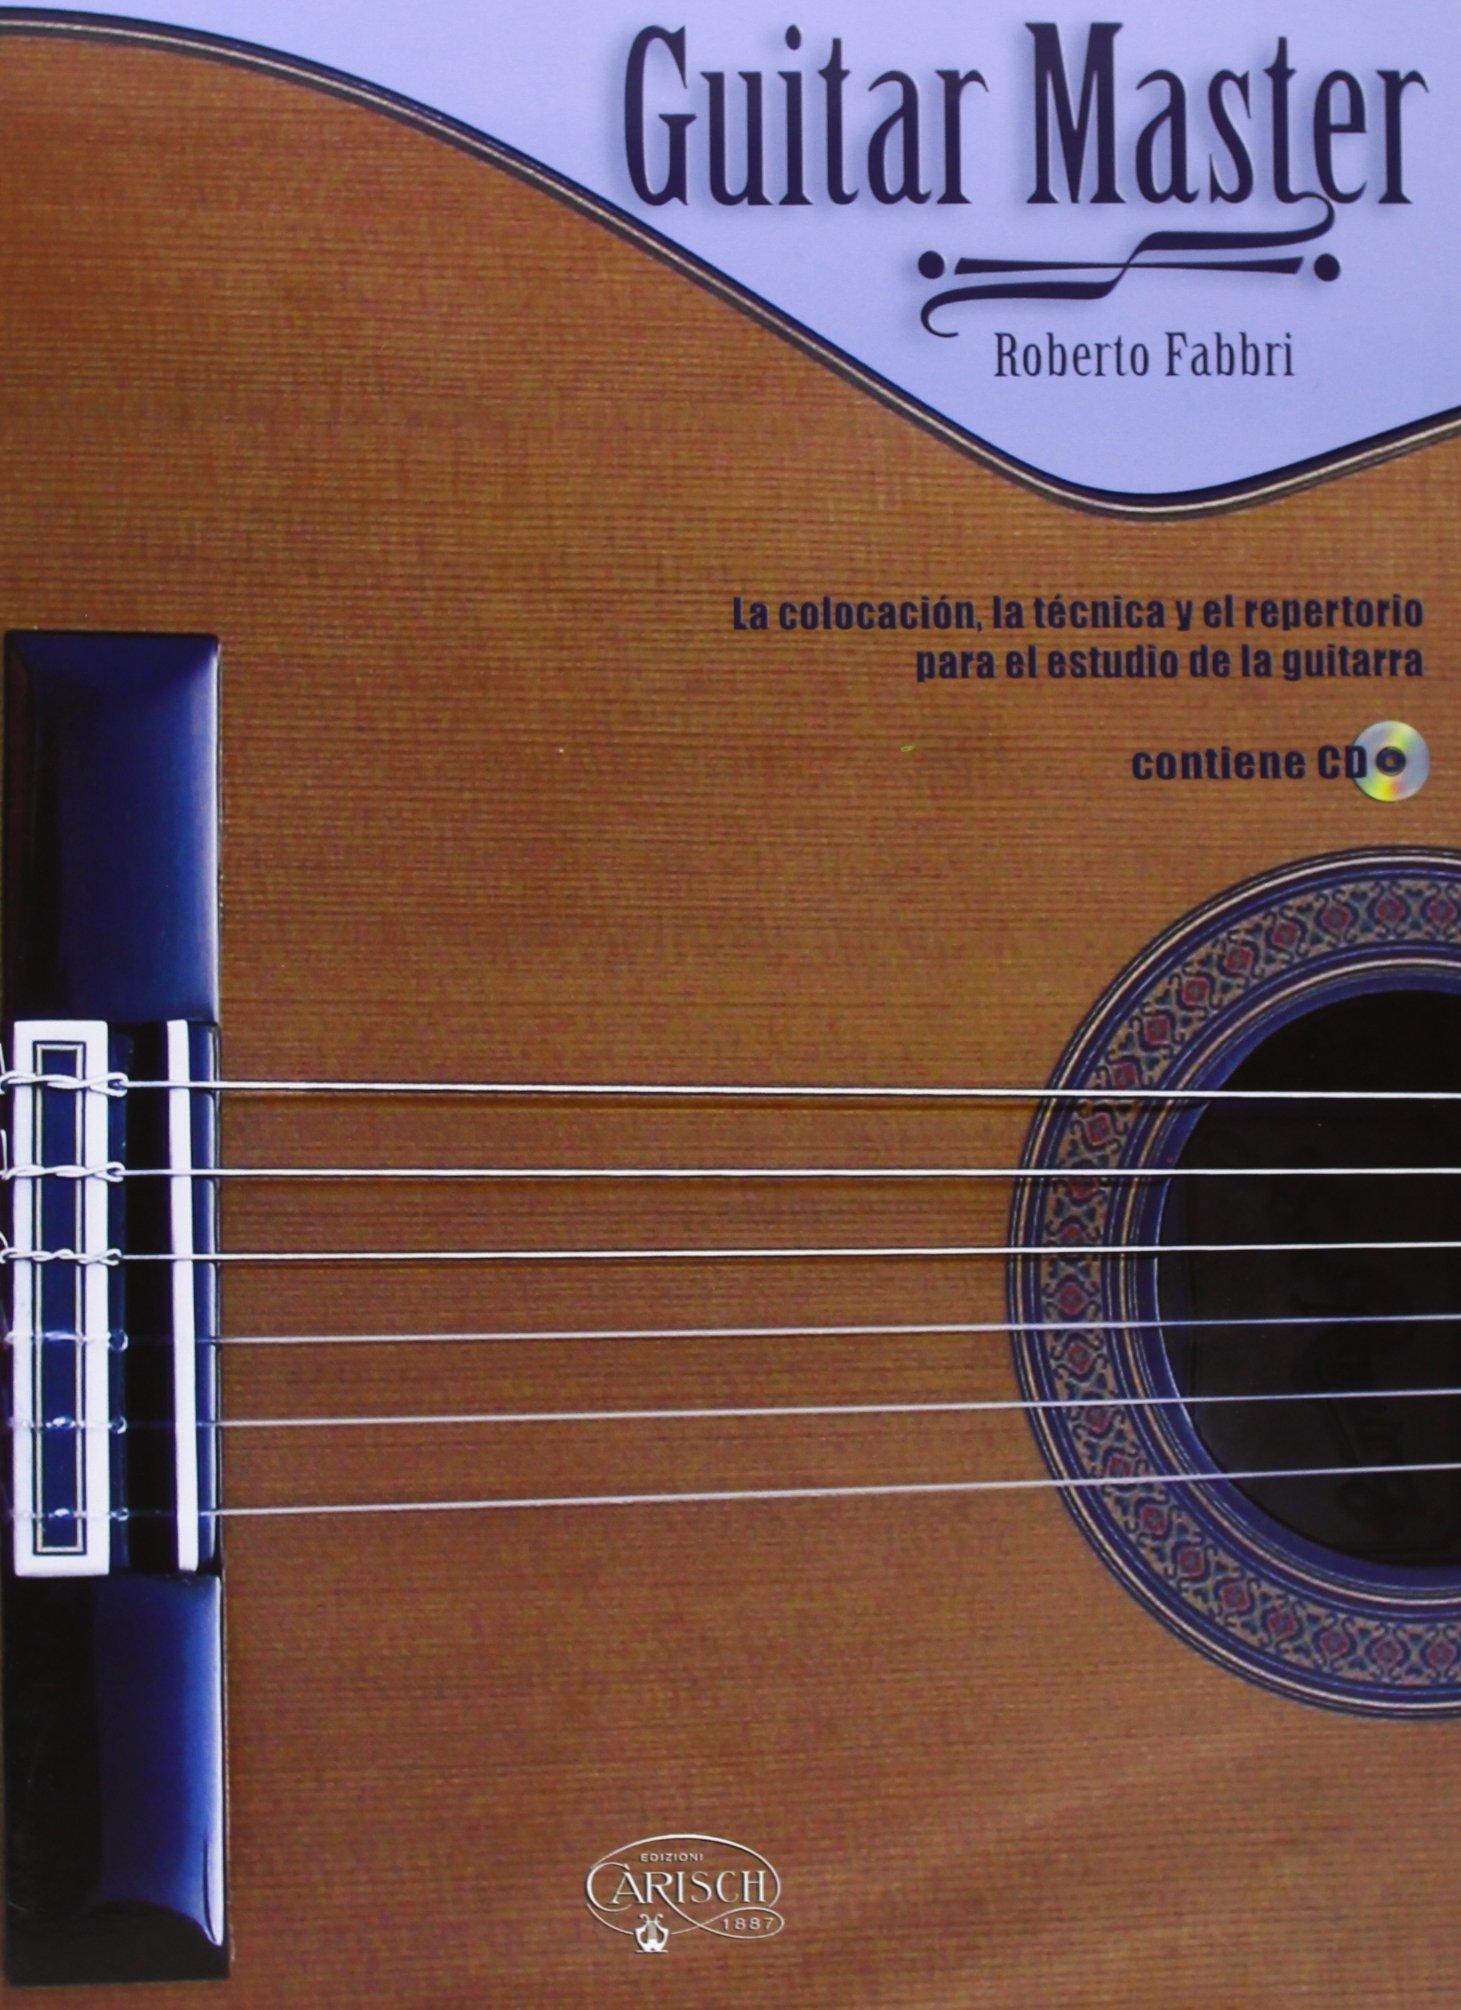 Guitar Master (RM Pedag Lenguaje musical): Amazon.es: Fabbri ...